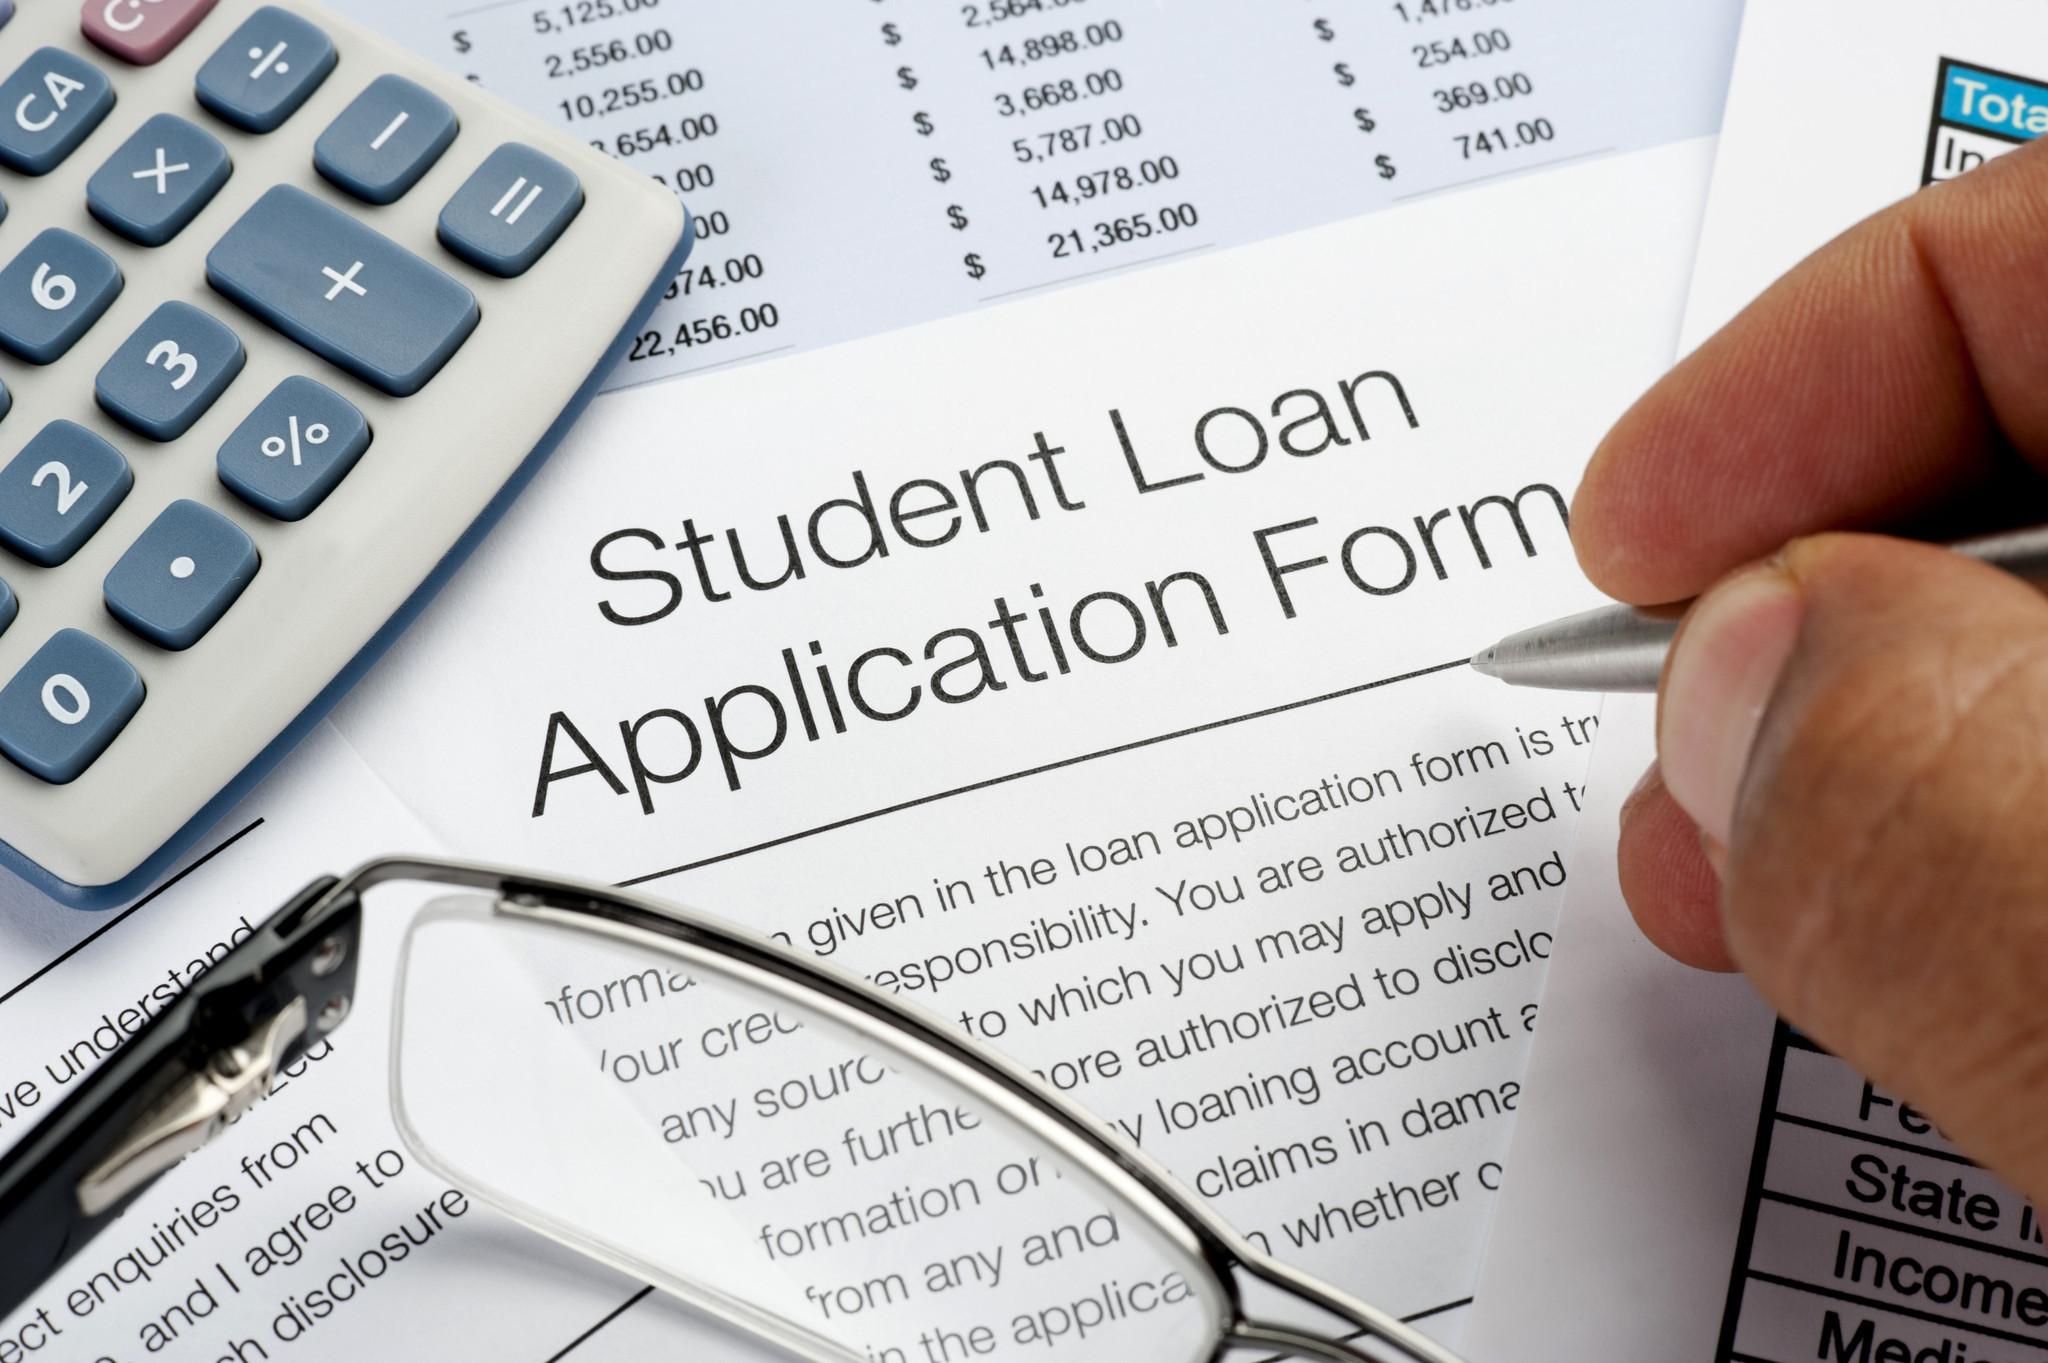 Federal student loan servicing still a problem, GAO report says